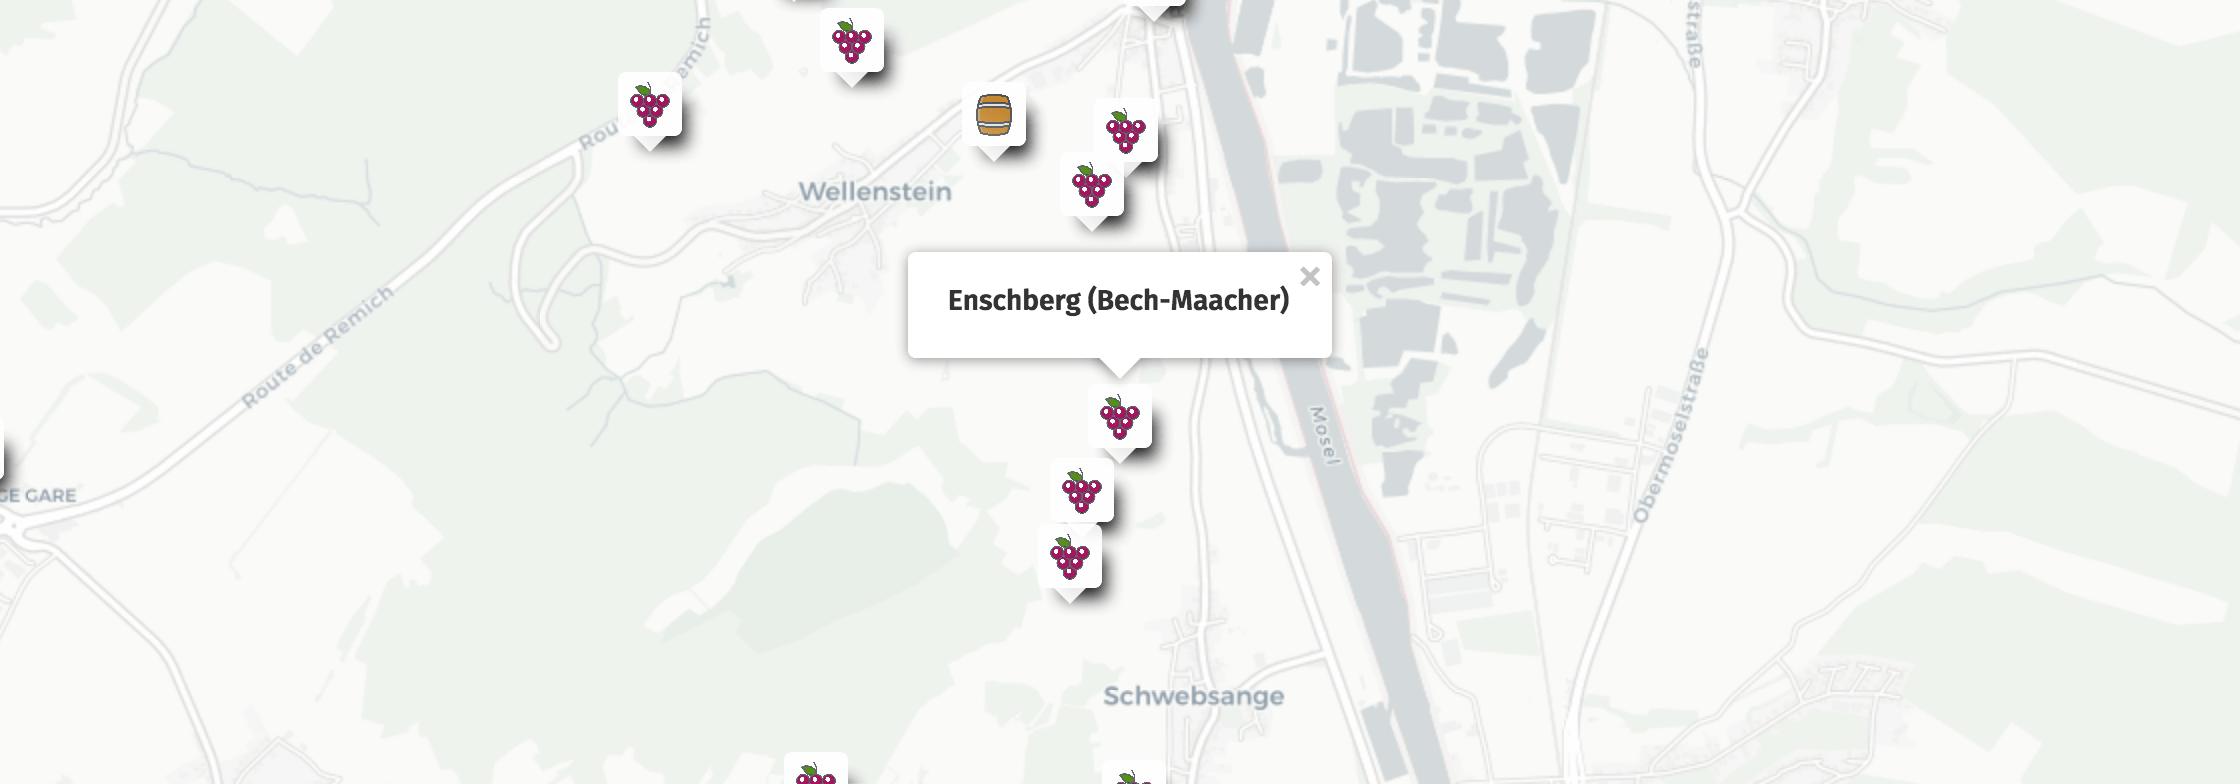 Geolocalisation des vins du Enschberg à Bech-Kleinmacher